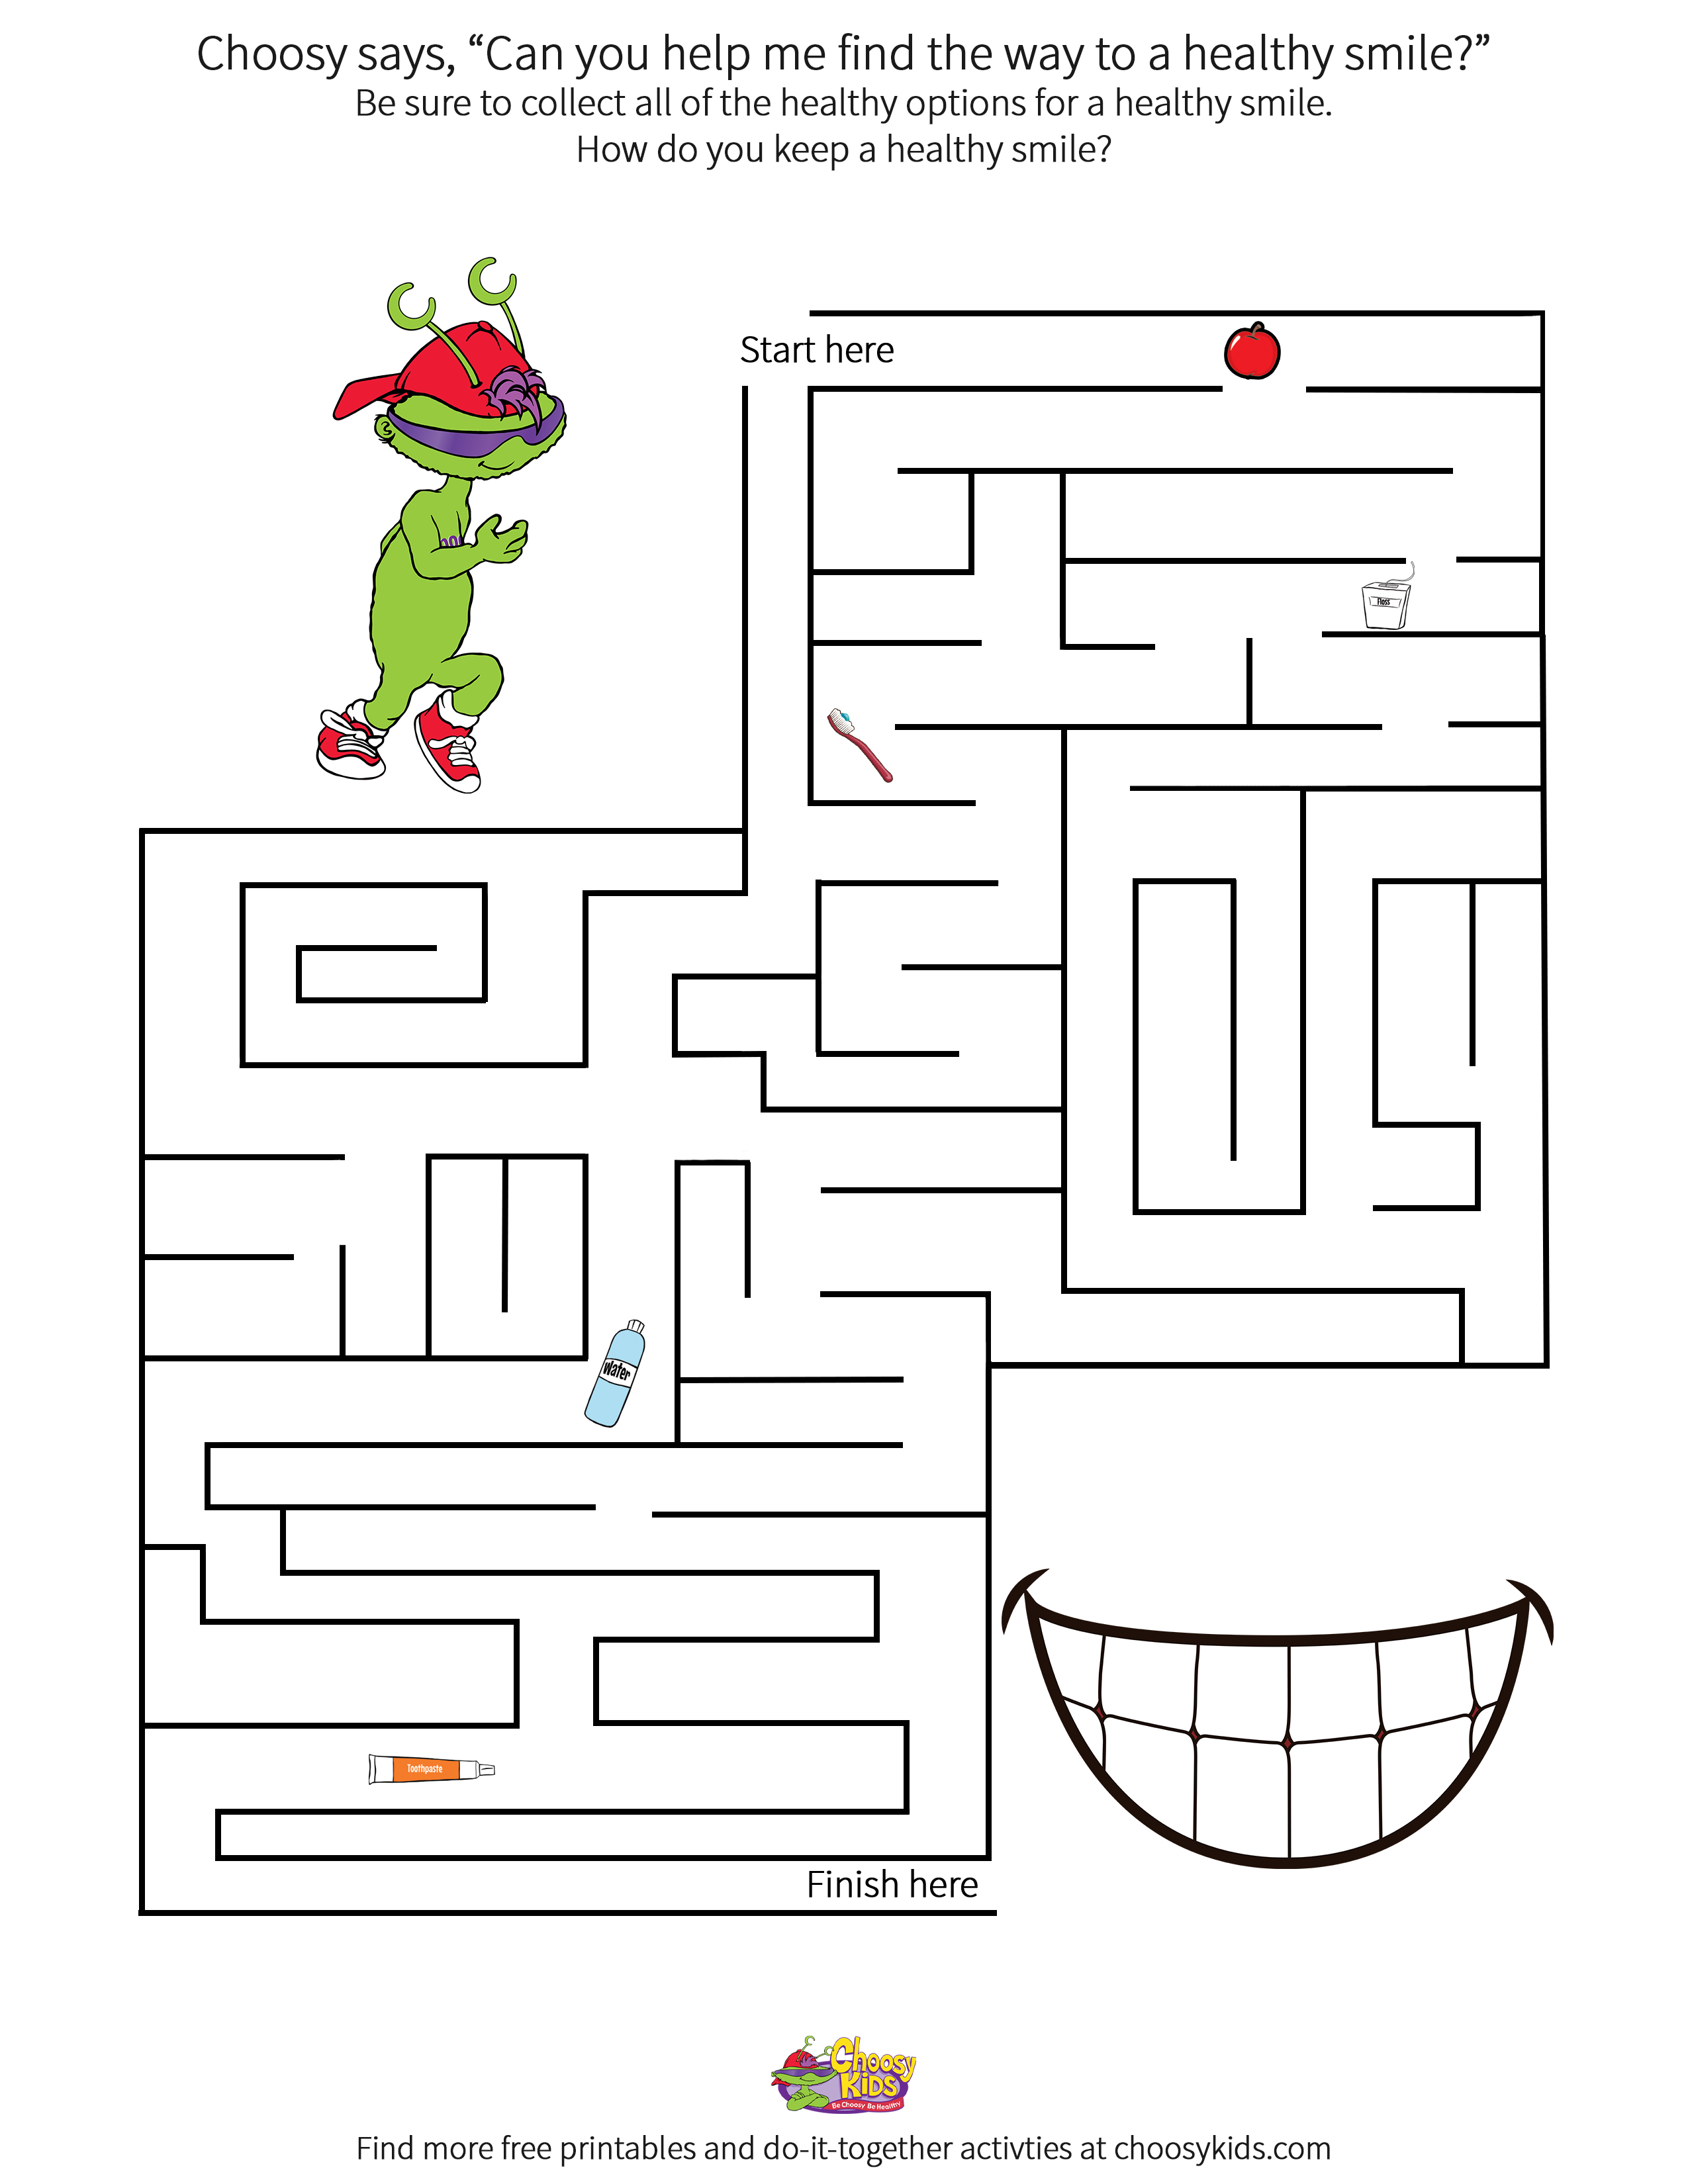 Choosy Healthy Smile Maze Printable